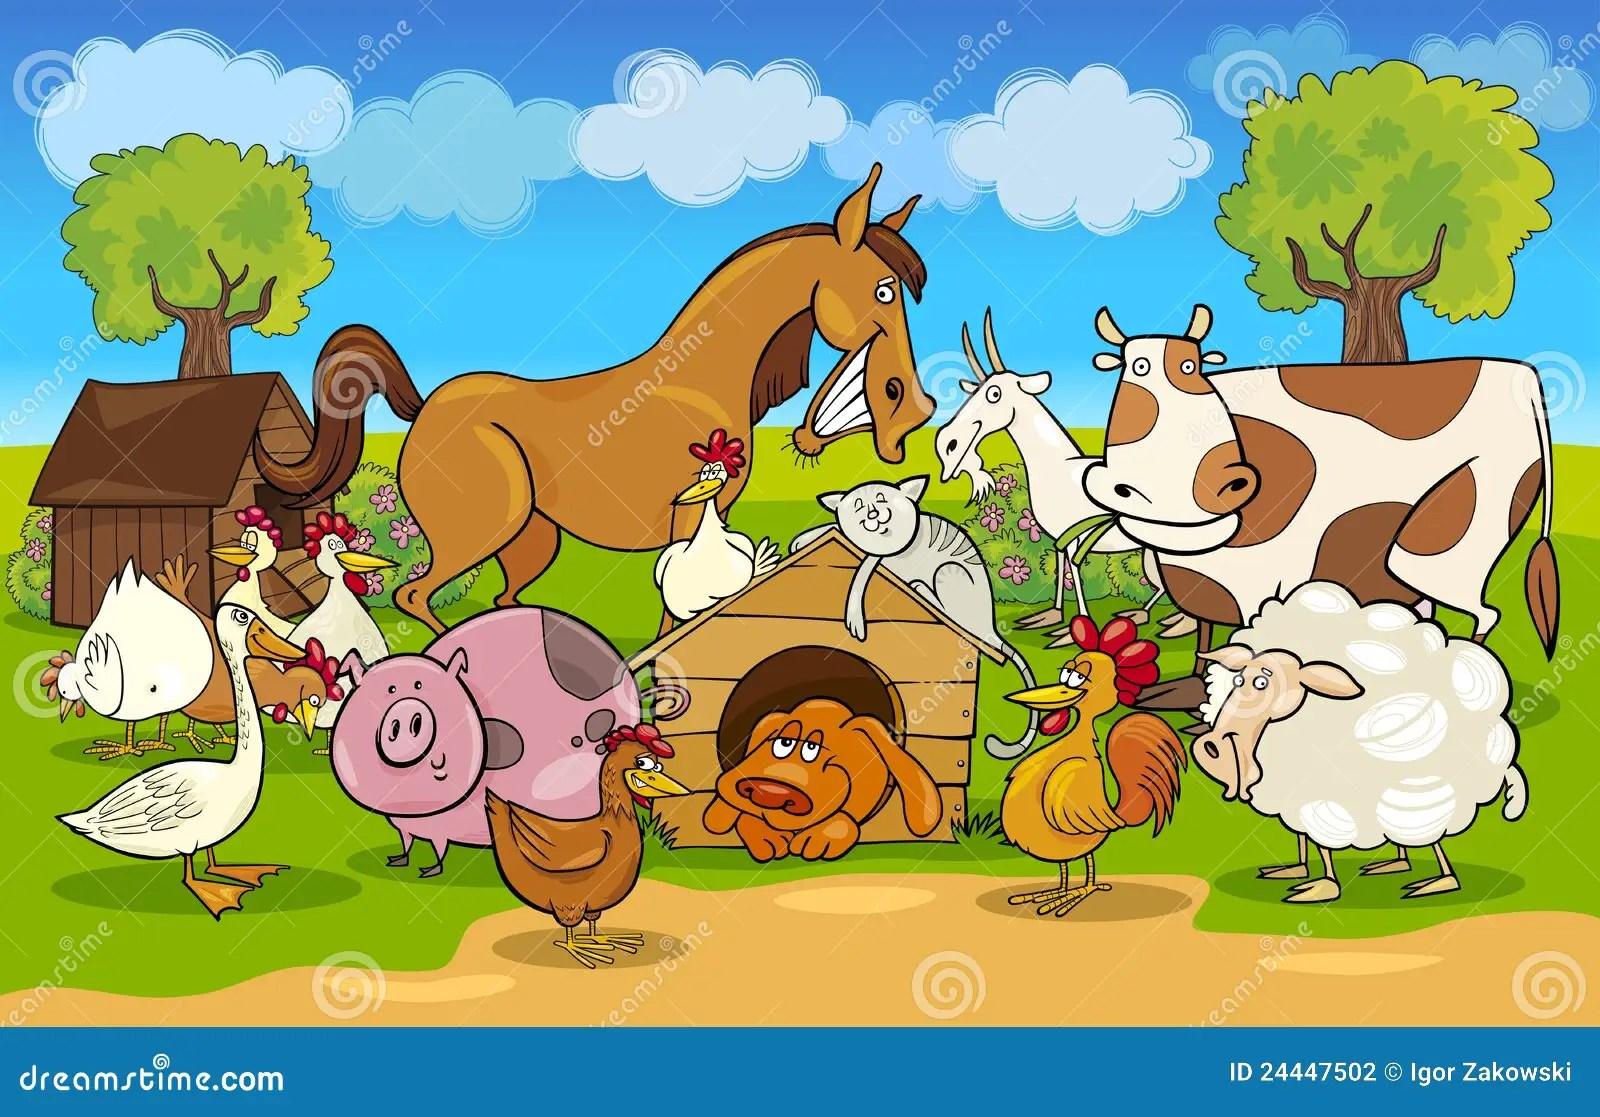 Cartoon Rural Scene With Farm Animals Stock Photography